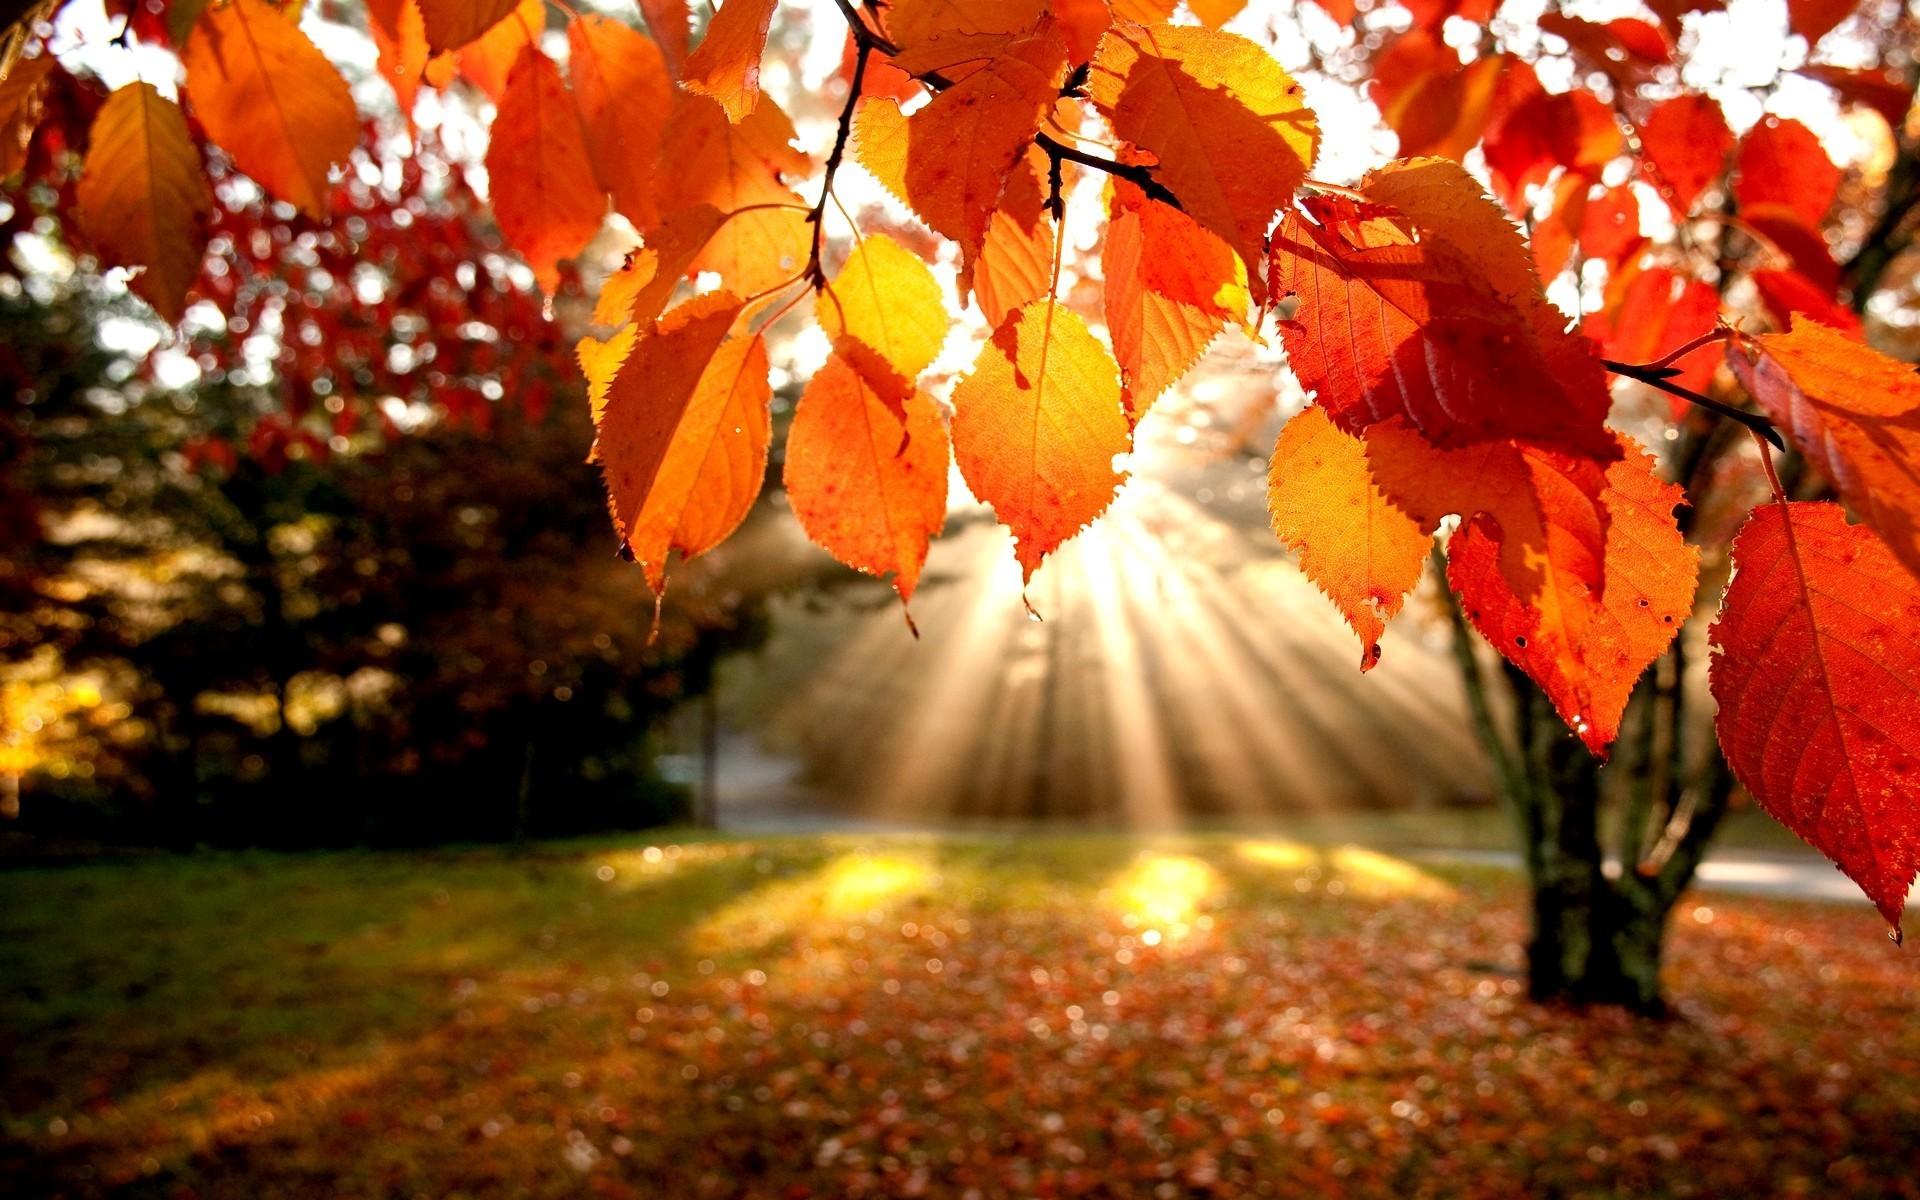 landscape falling leaves picture